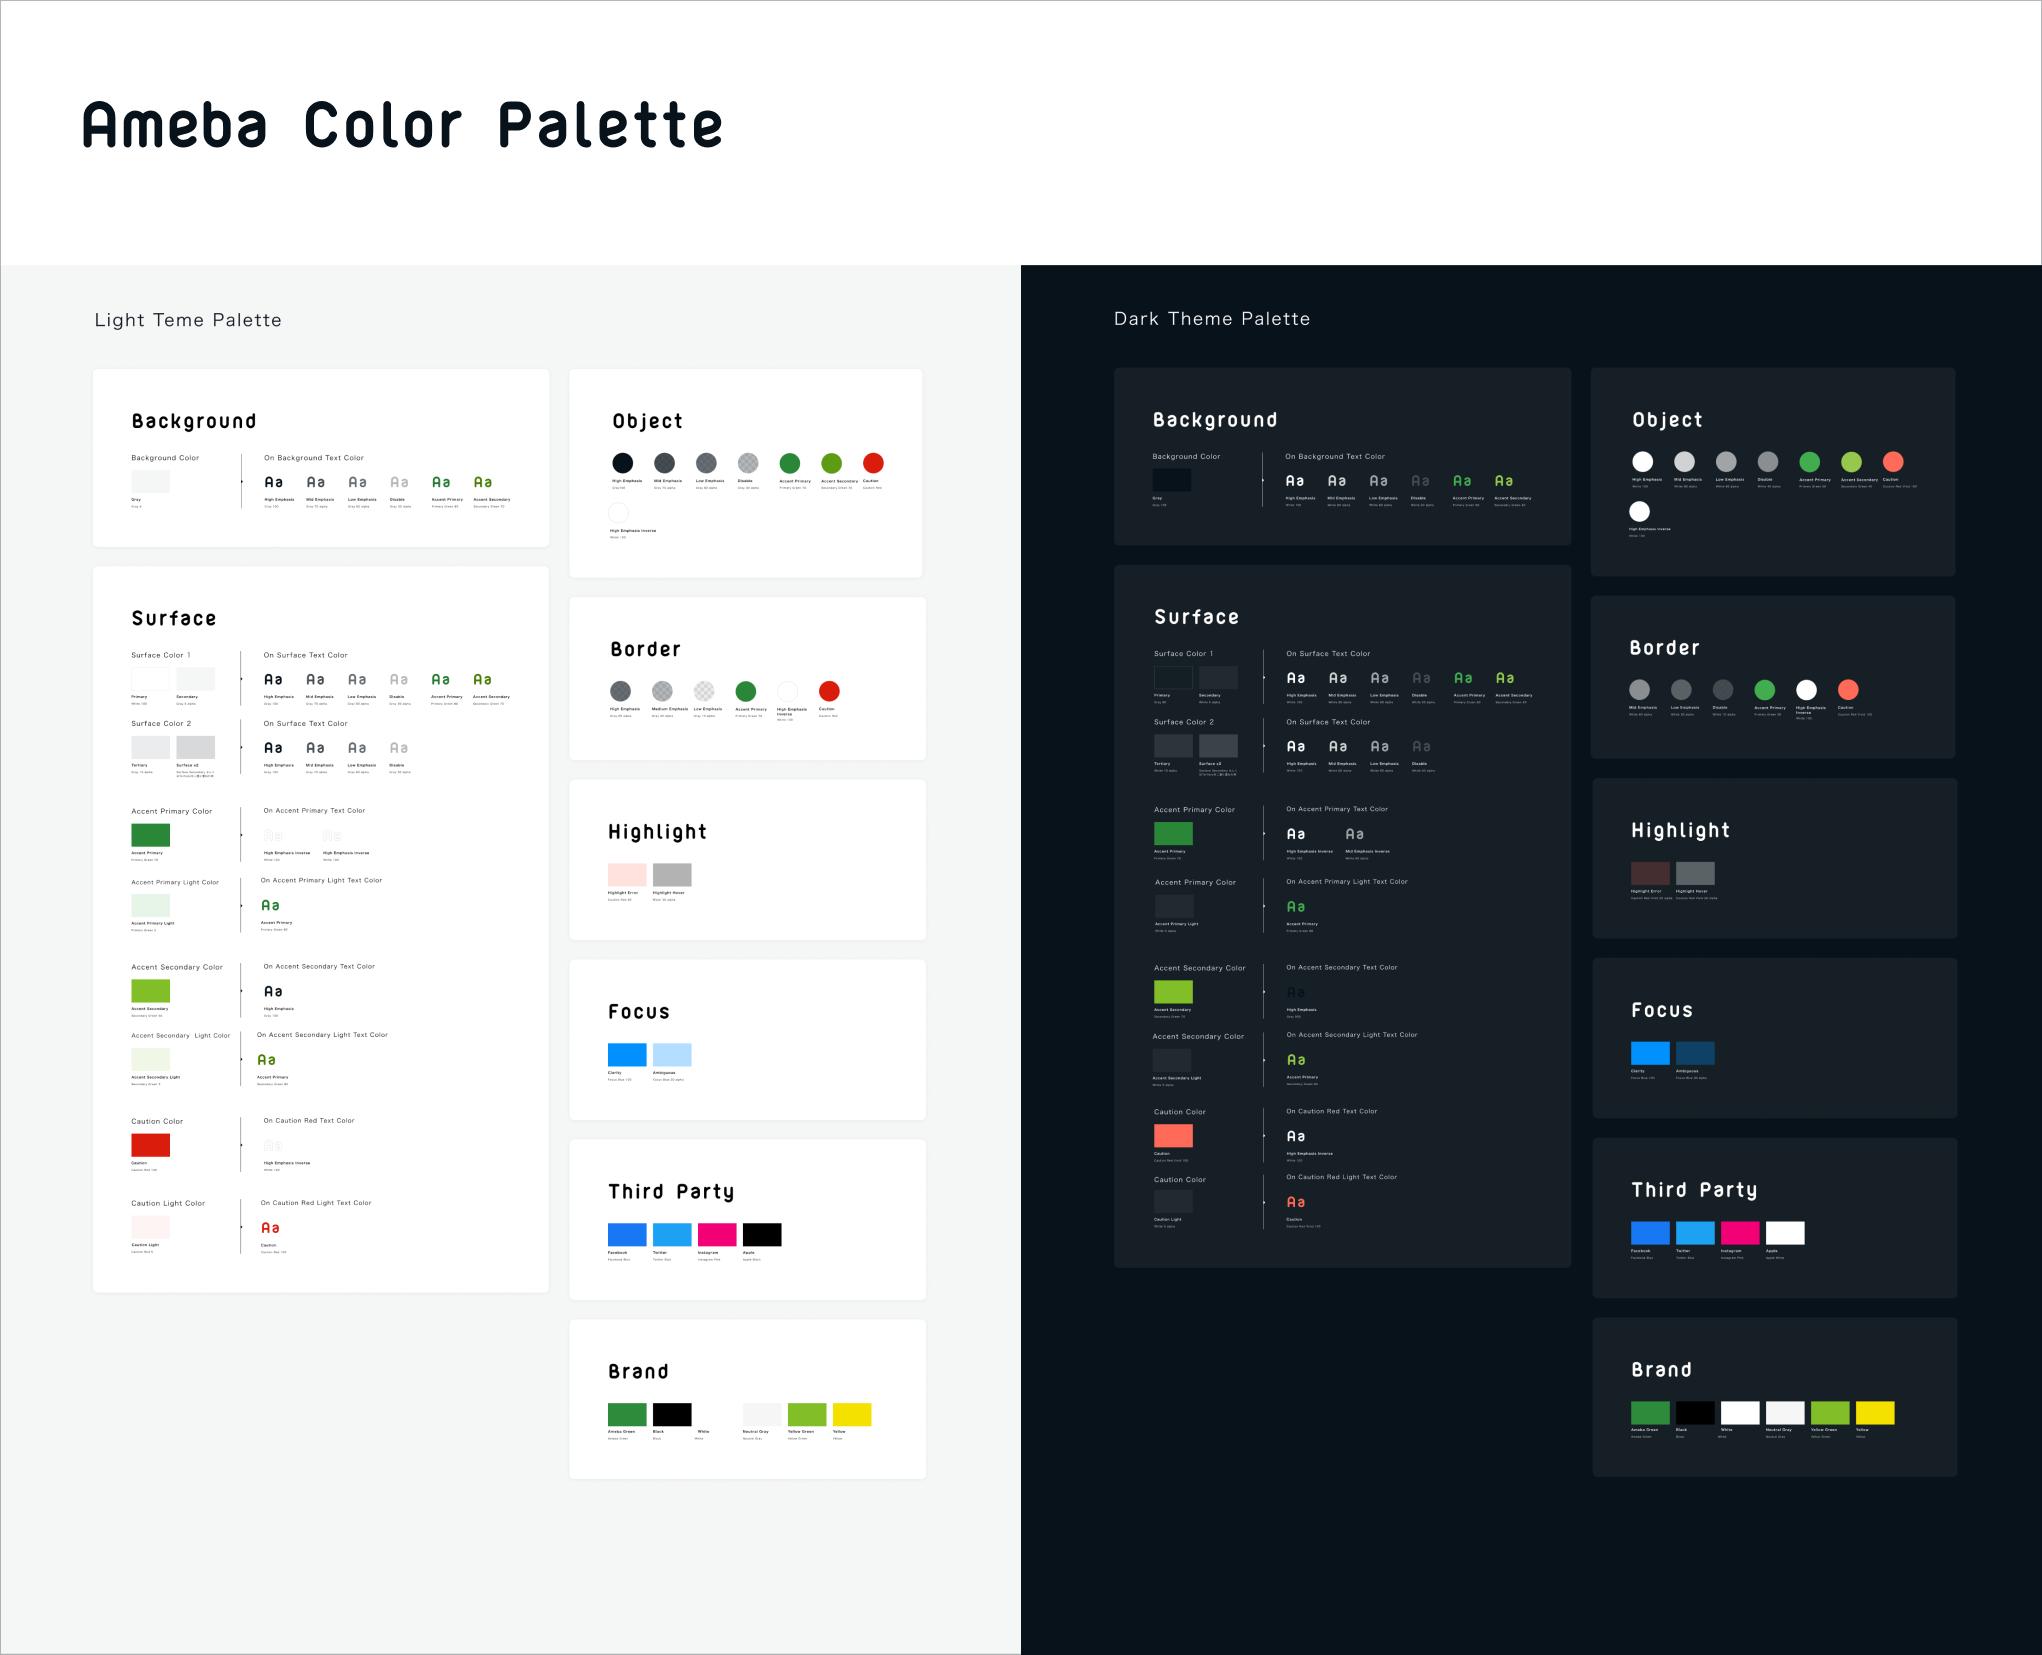 Ameba Color Palette